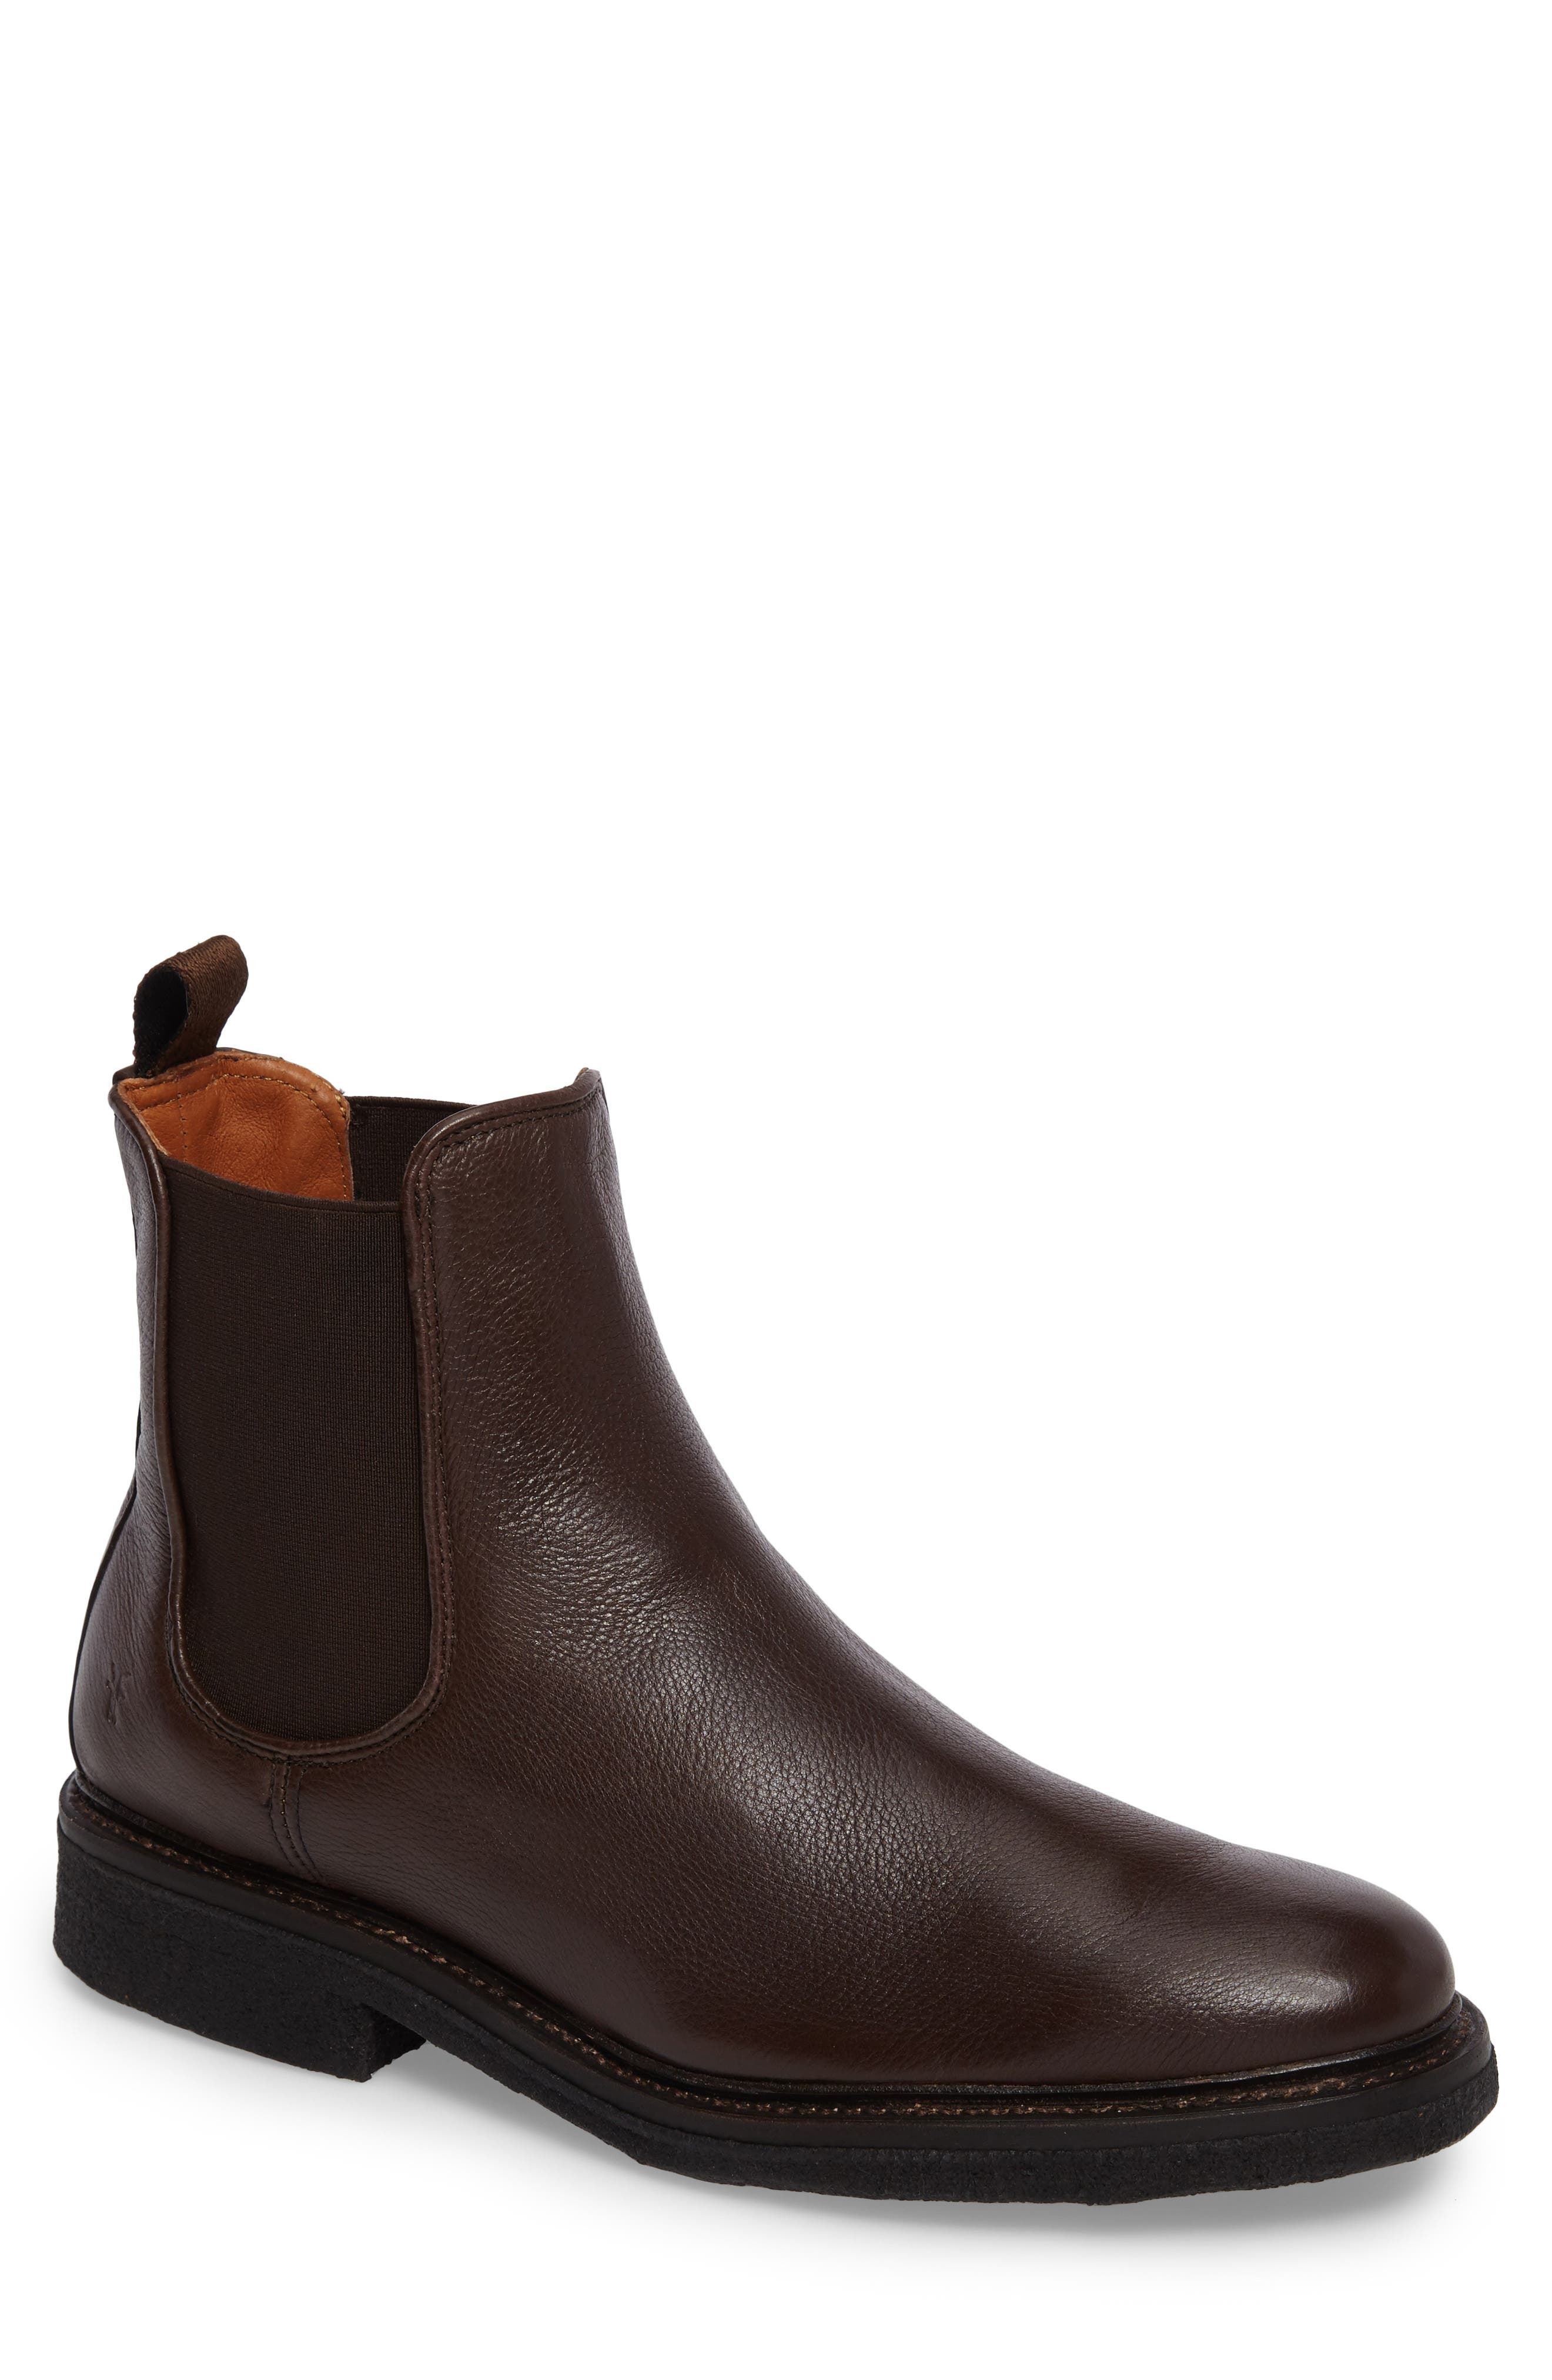 Country Chelsea Boot,                         Main,                         color, Dark Brown